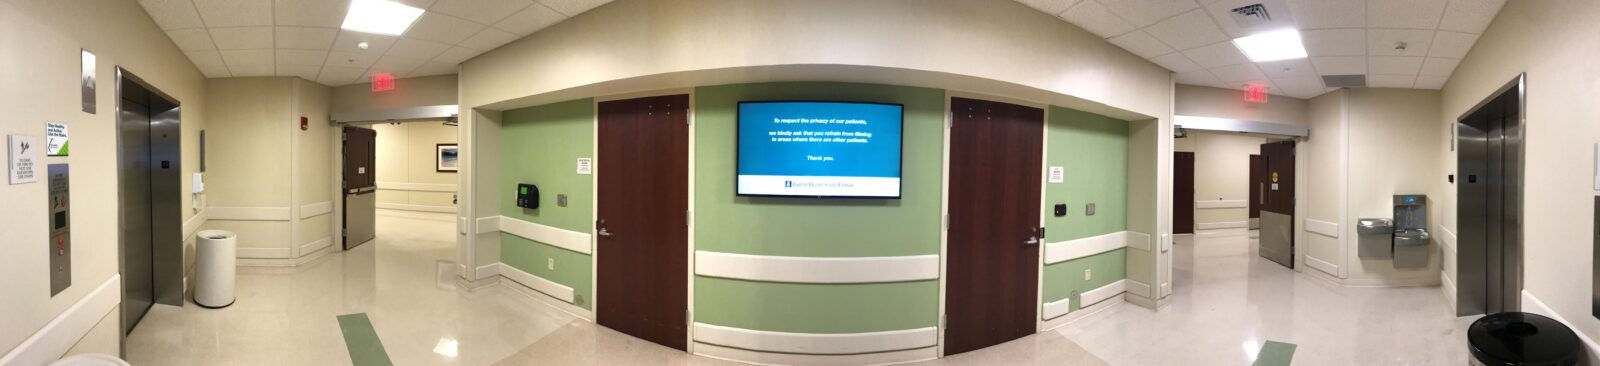 WHBH Elevators